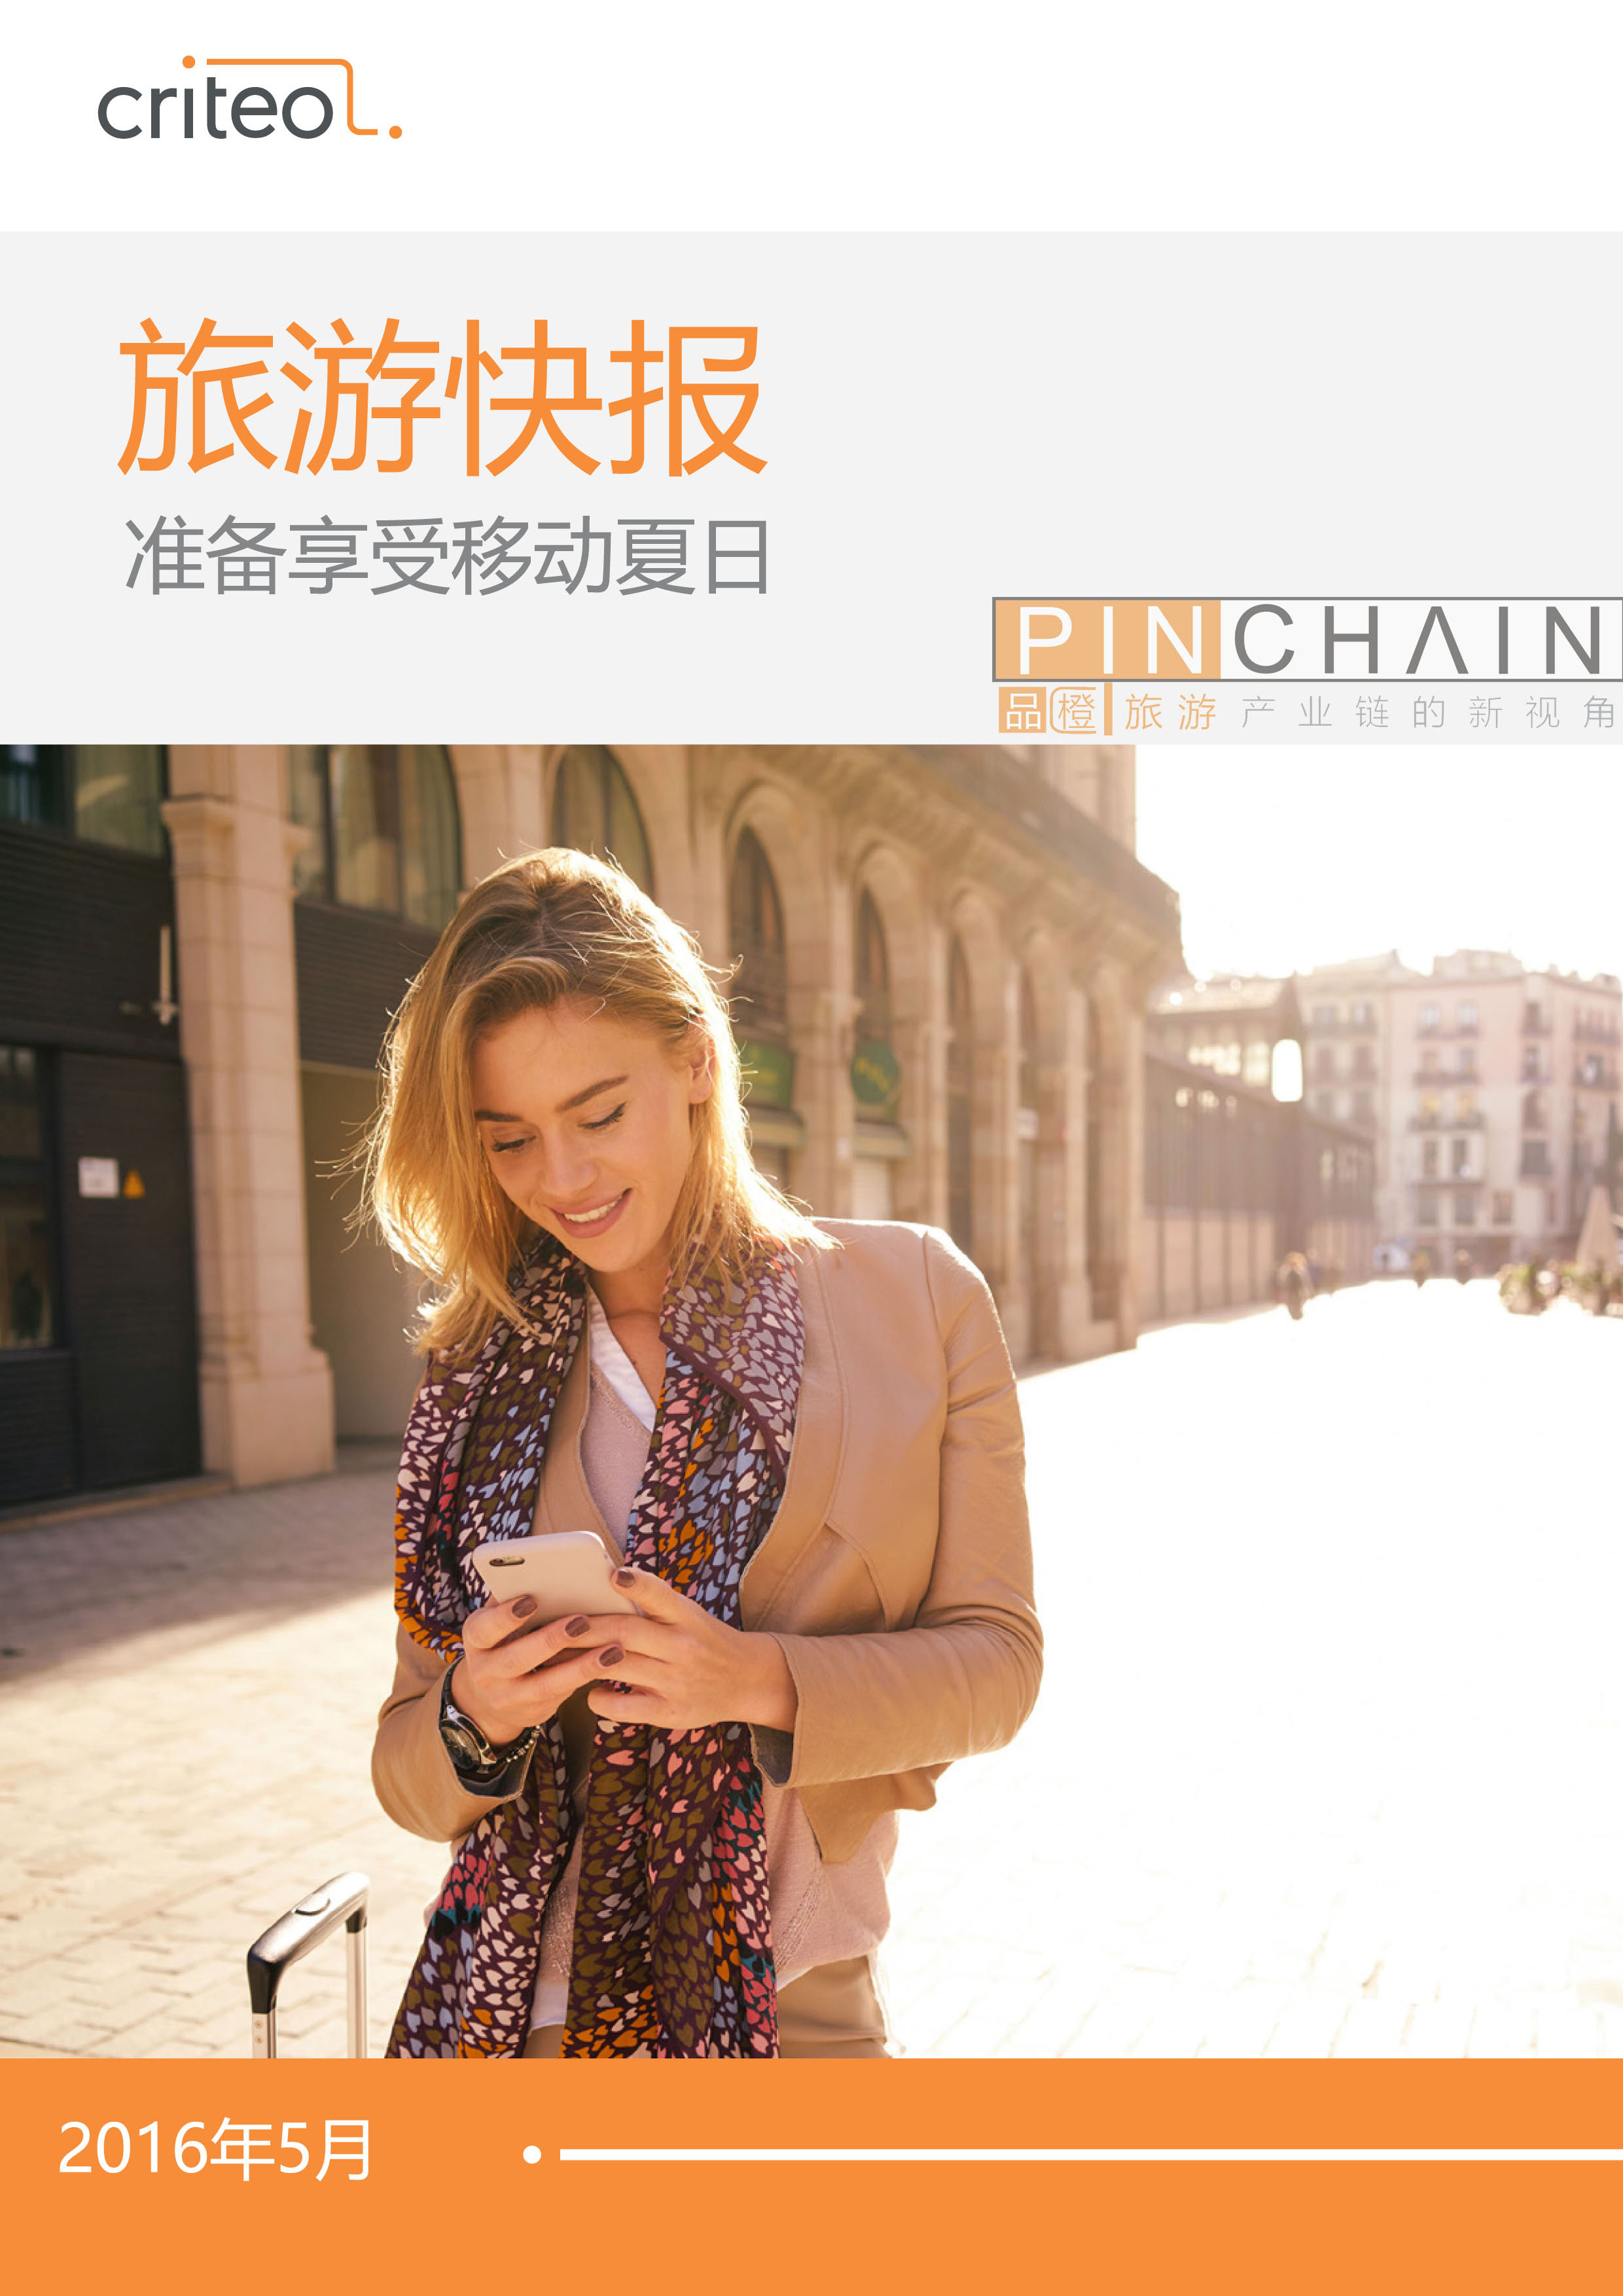 Criteo大报告:《旅游快报—准备享受移动夏日》